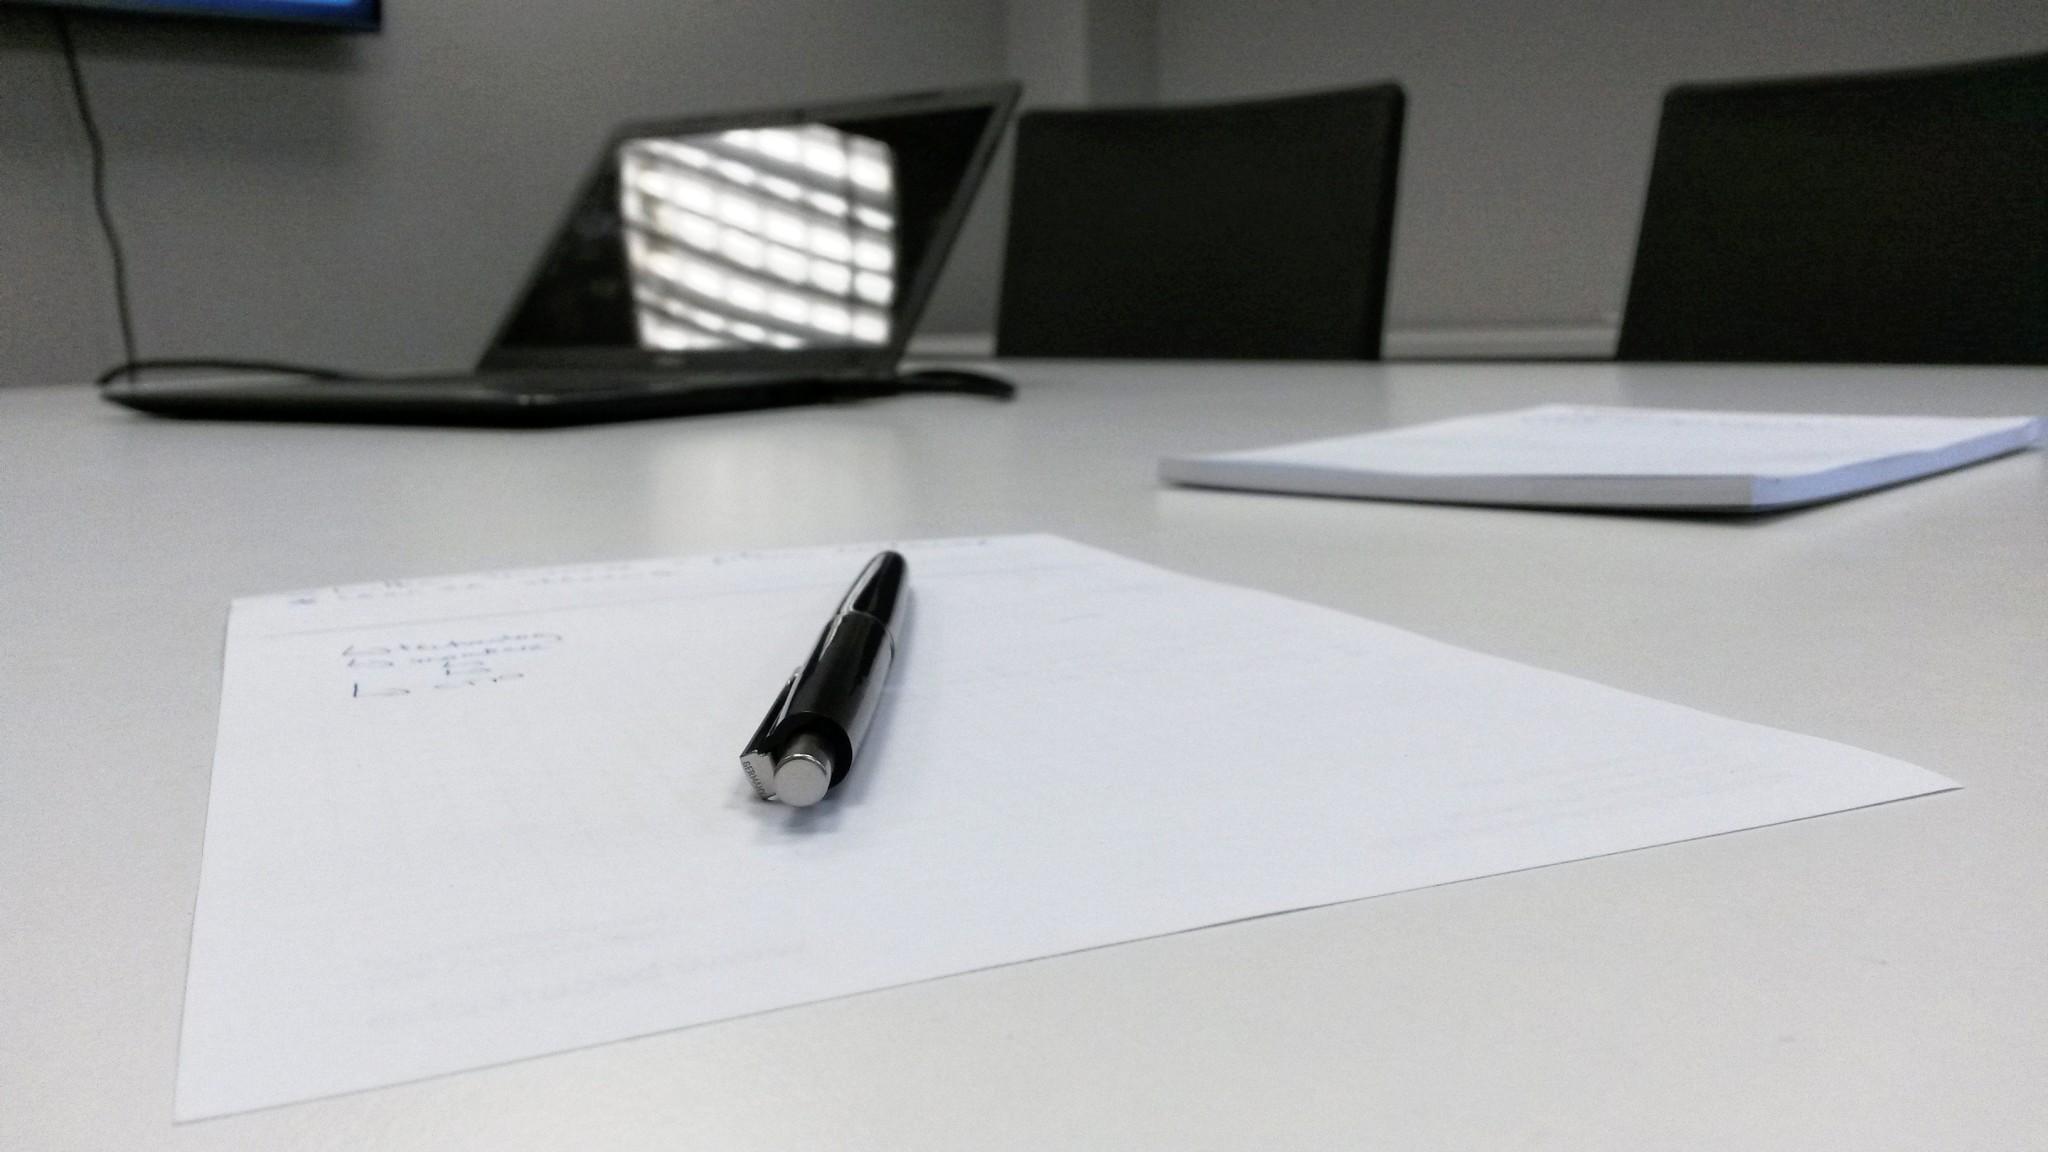 desk-meeting-pencil-77962